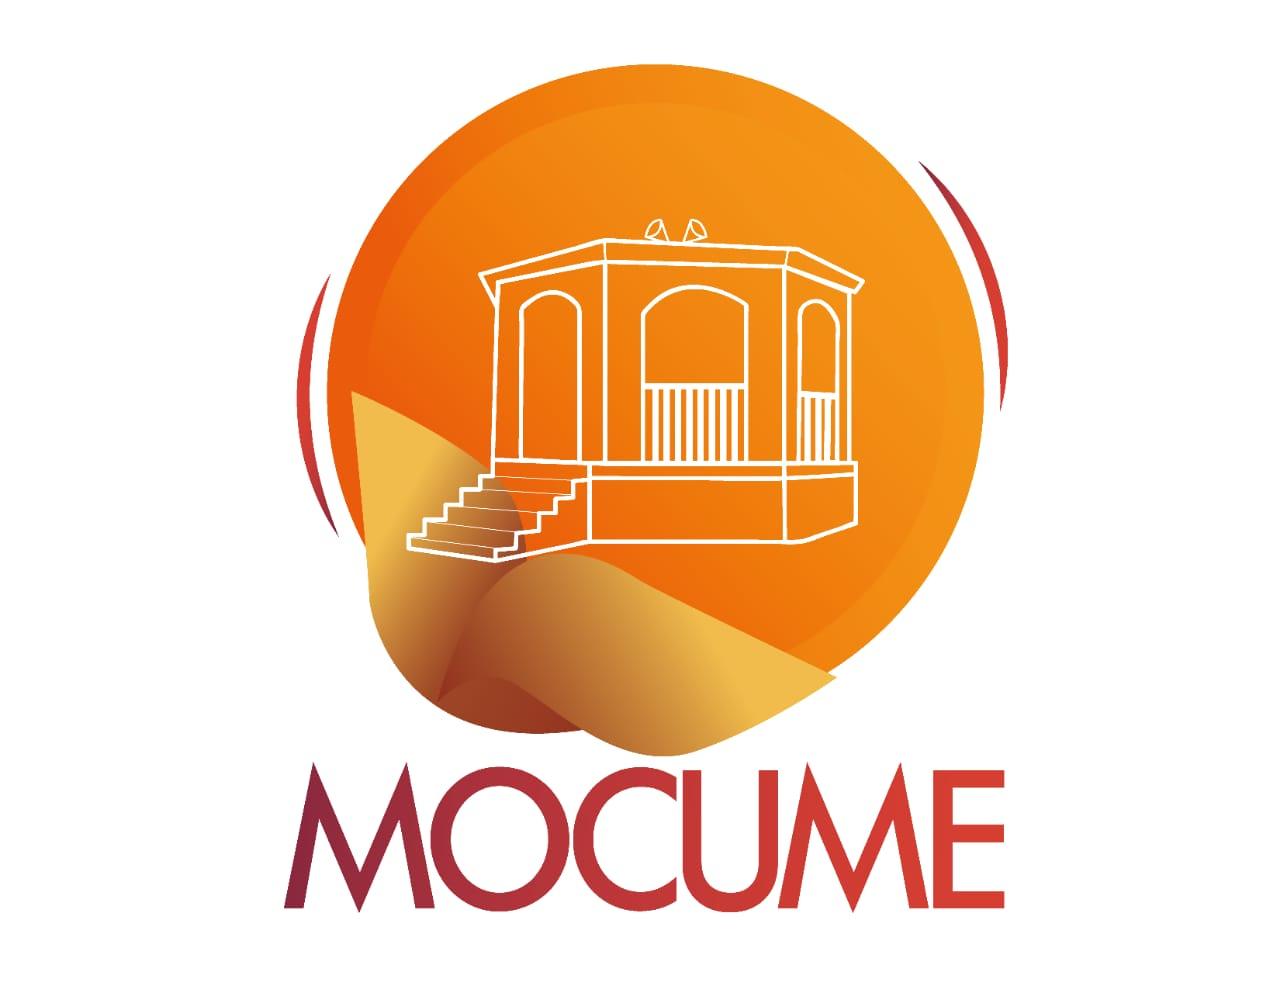 Mocume